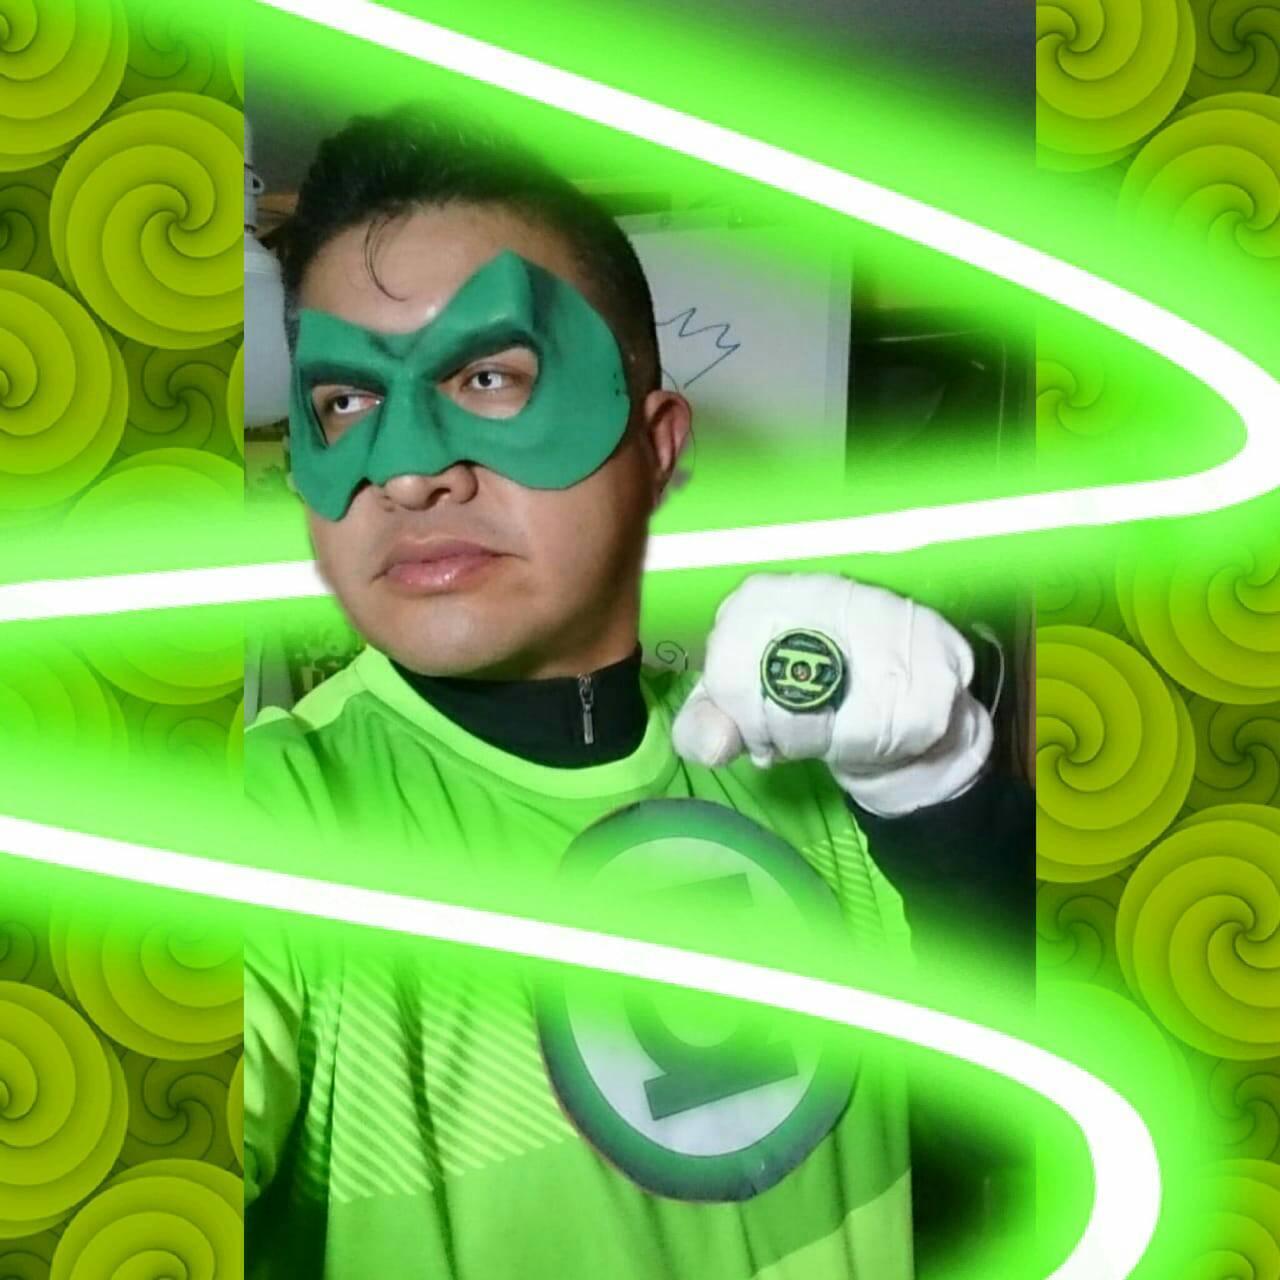 Profesor se disfraza de superheroe para dar clase